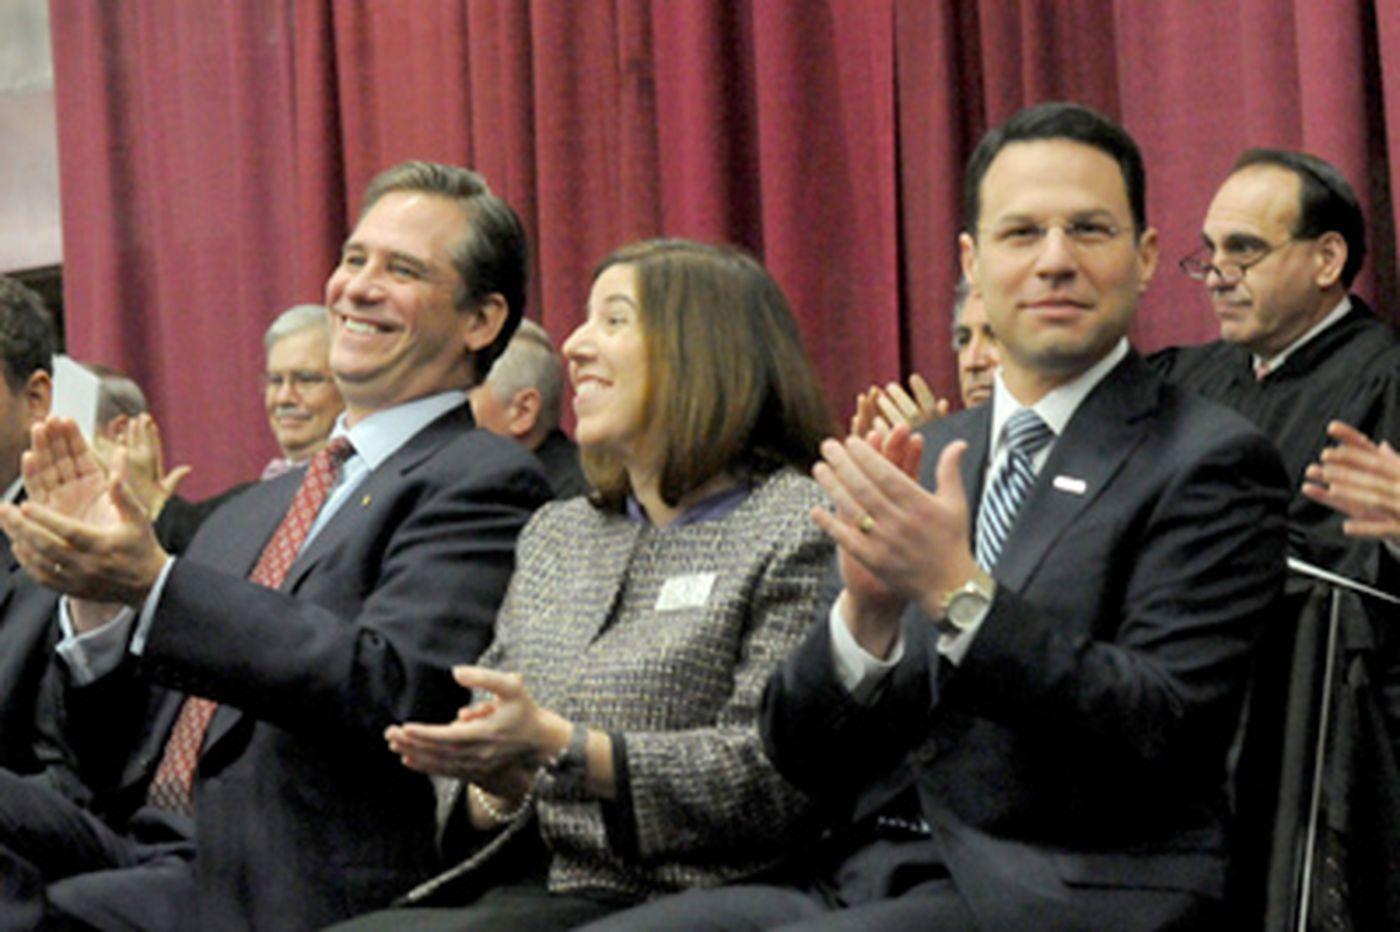 Shapiro, Richards pledge civility as first Democrats to lead Montco since 1870s